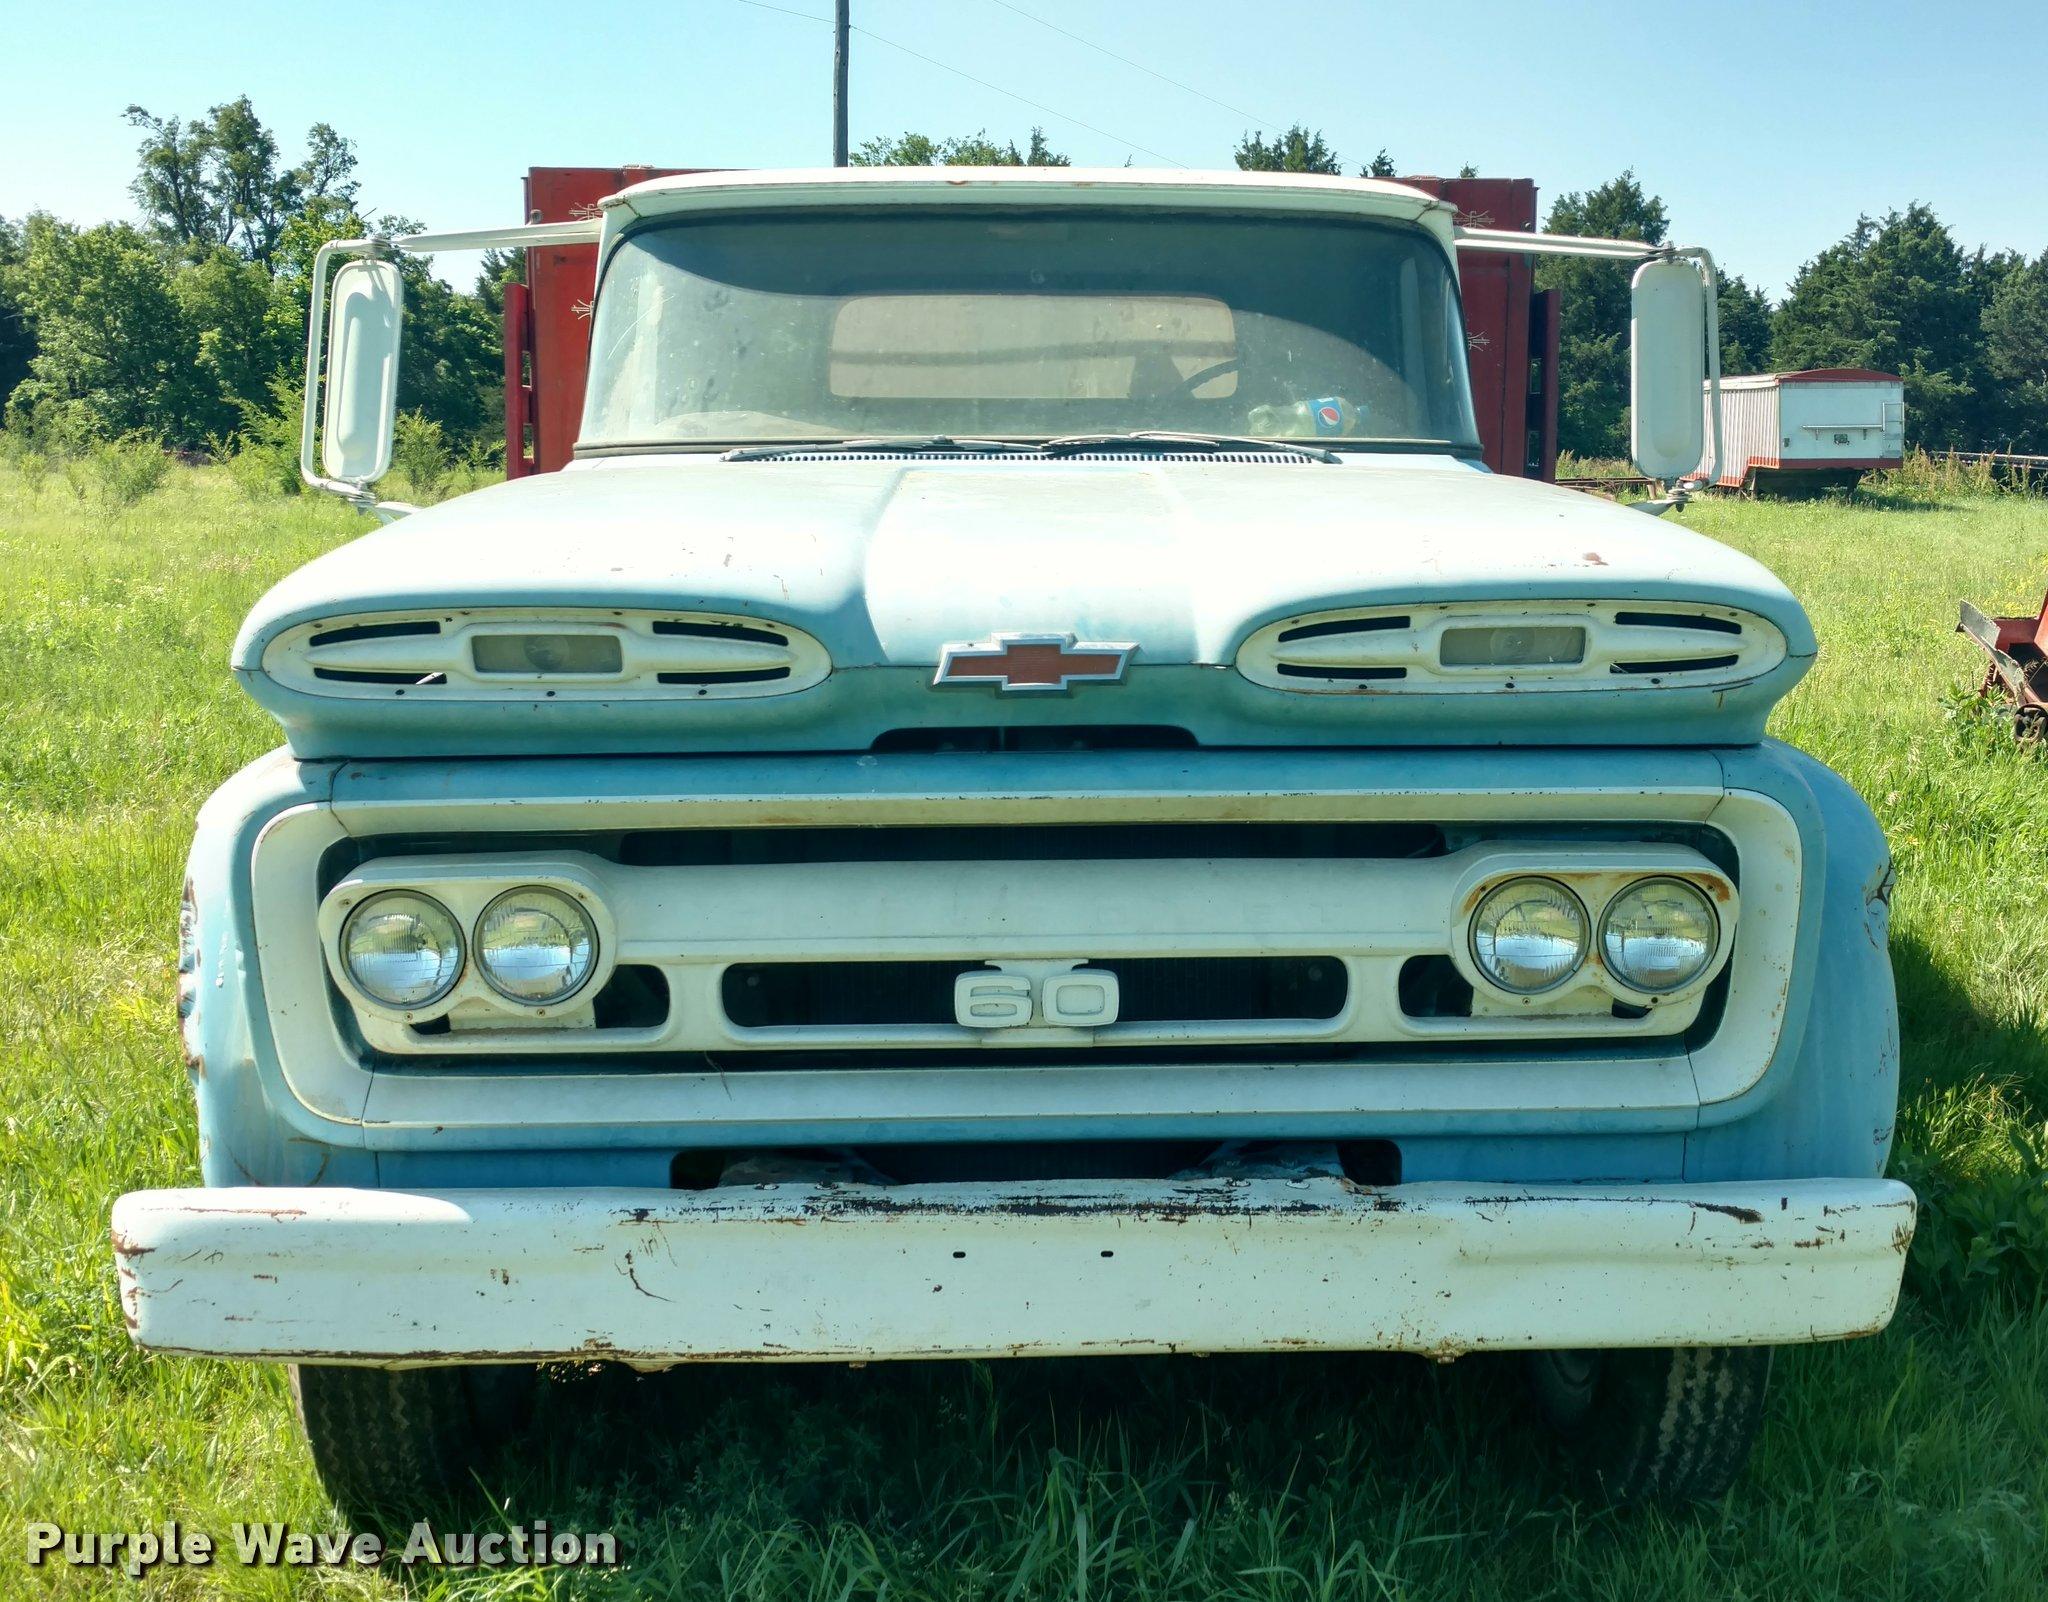 1961 Chevrolet C60 Viking Grain Truck Item Db0987 Sold Chevy Crew Cab Full Size In New Window